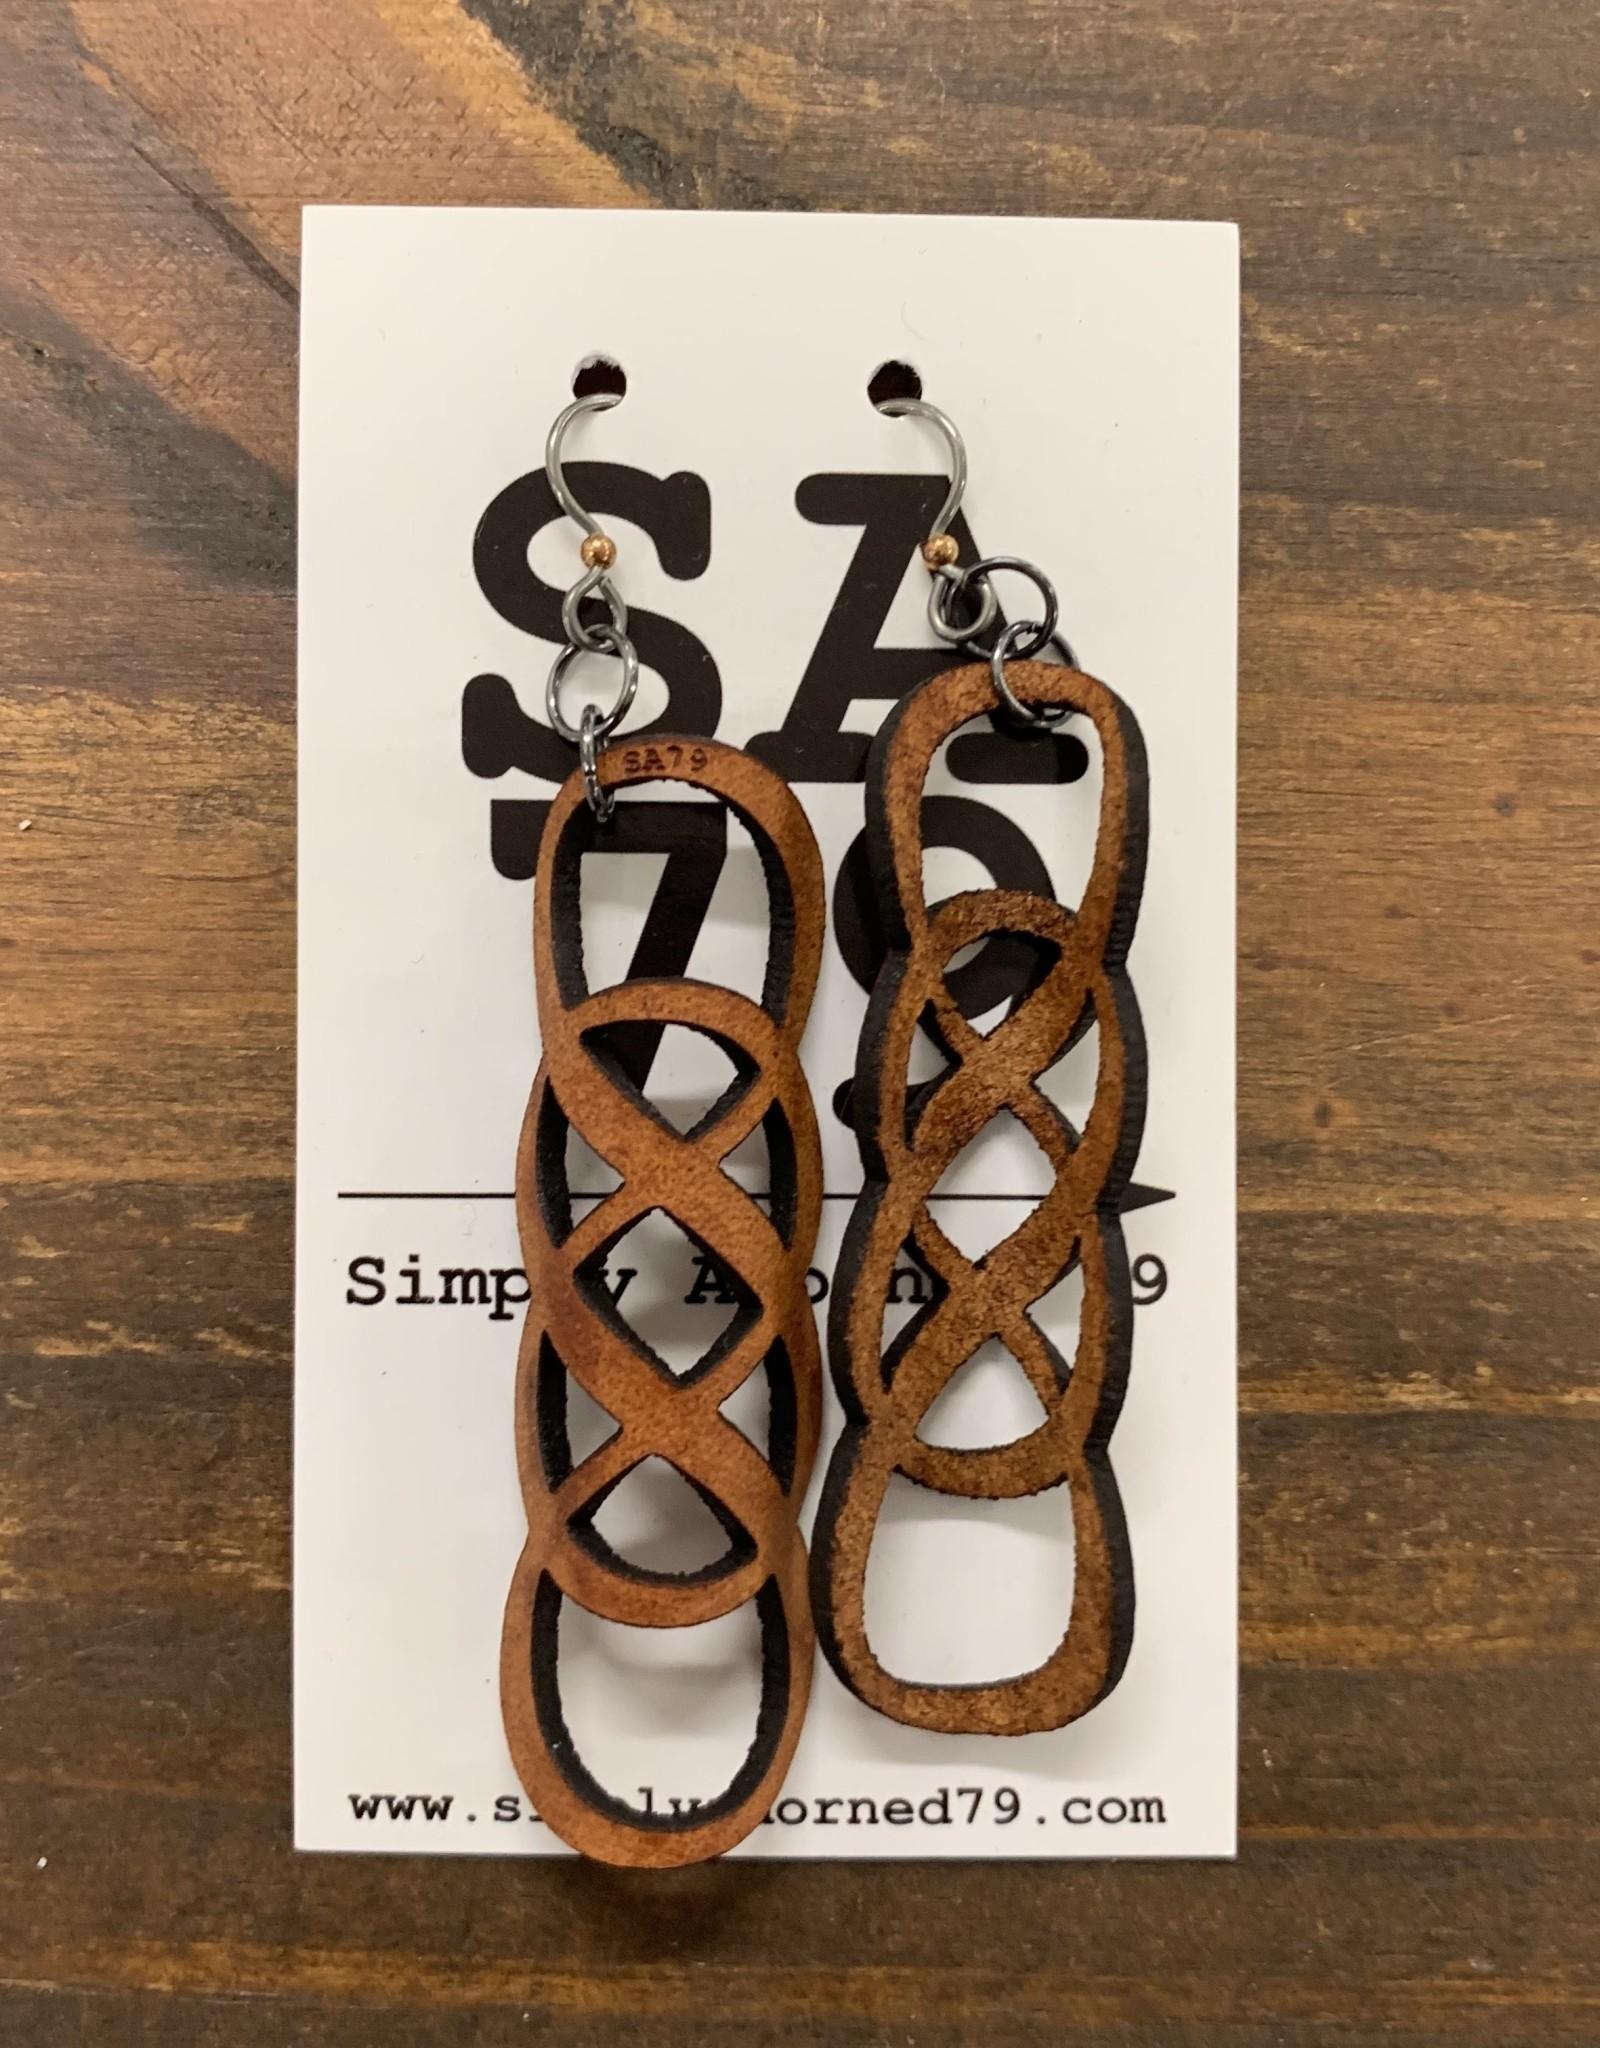 SA79 - THE INFINITY- TAN EARRING